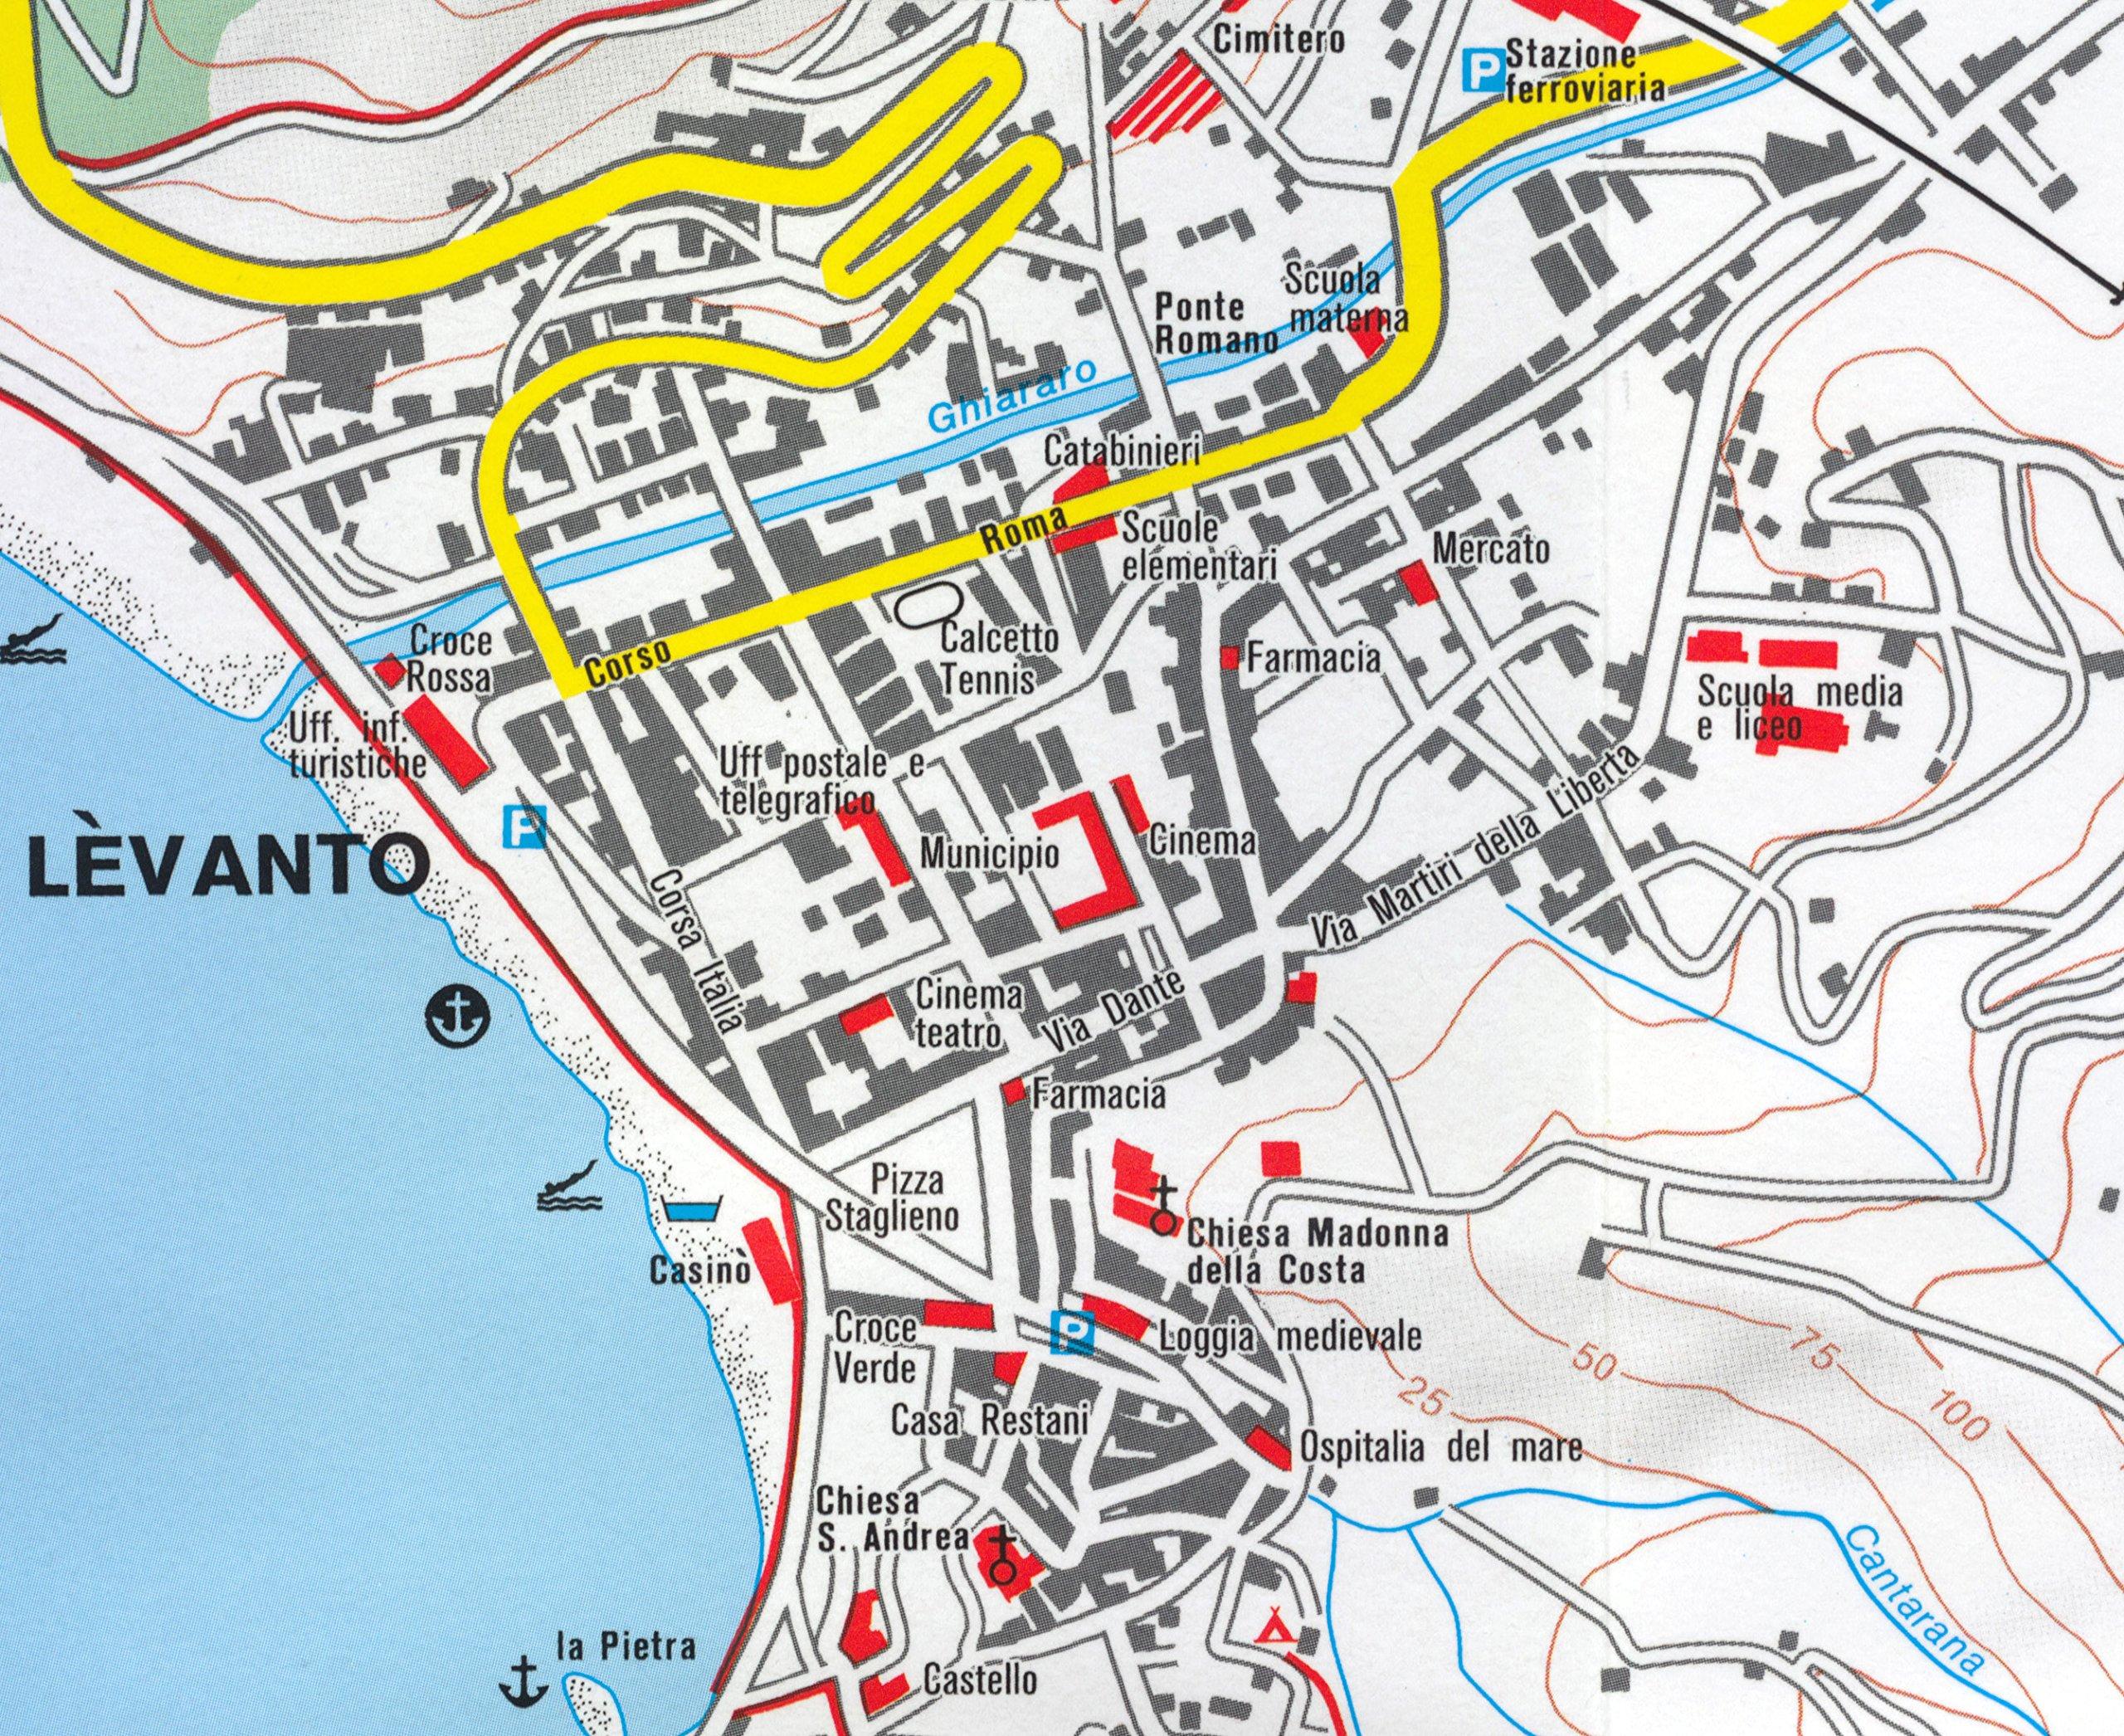 Corniglia Italy Map.Cinque Terre Italy 1 50 000 Hiking Map Waterproof Kompass